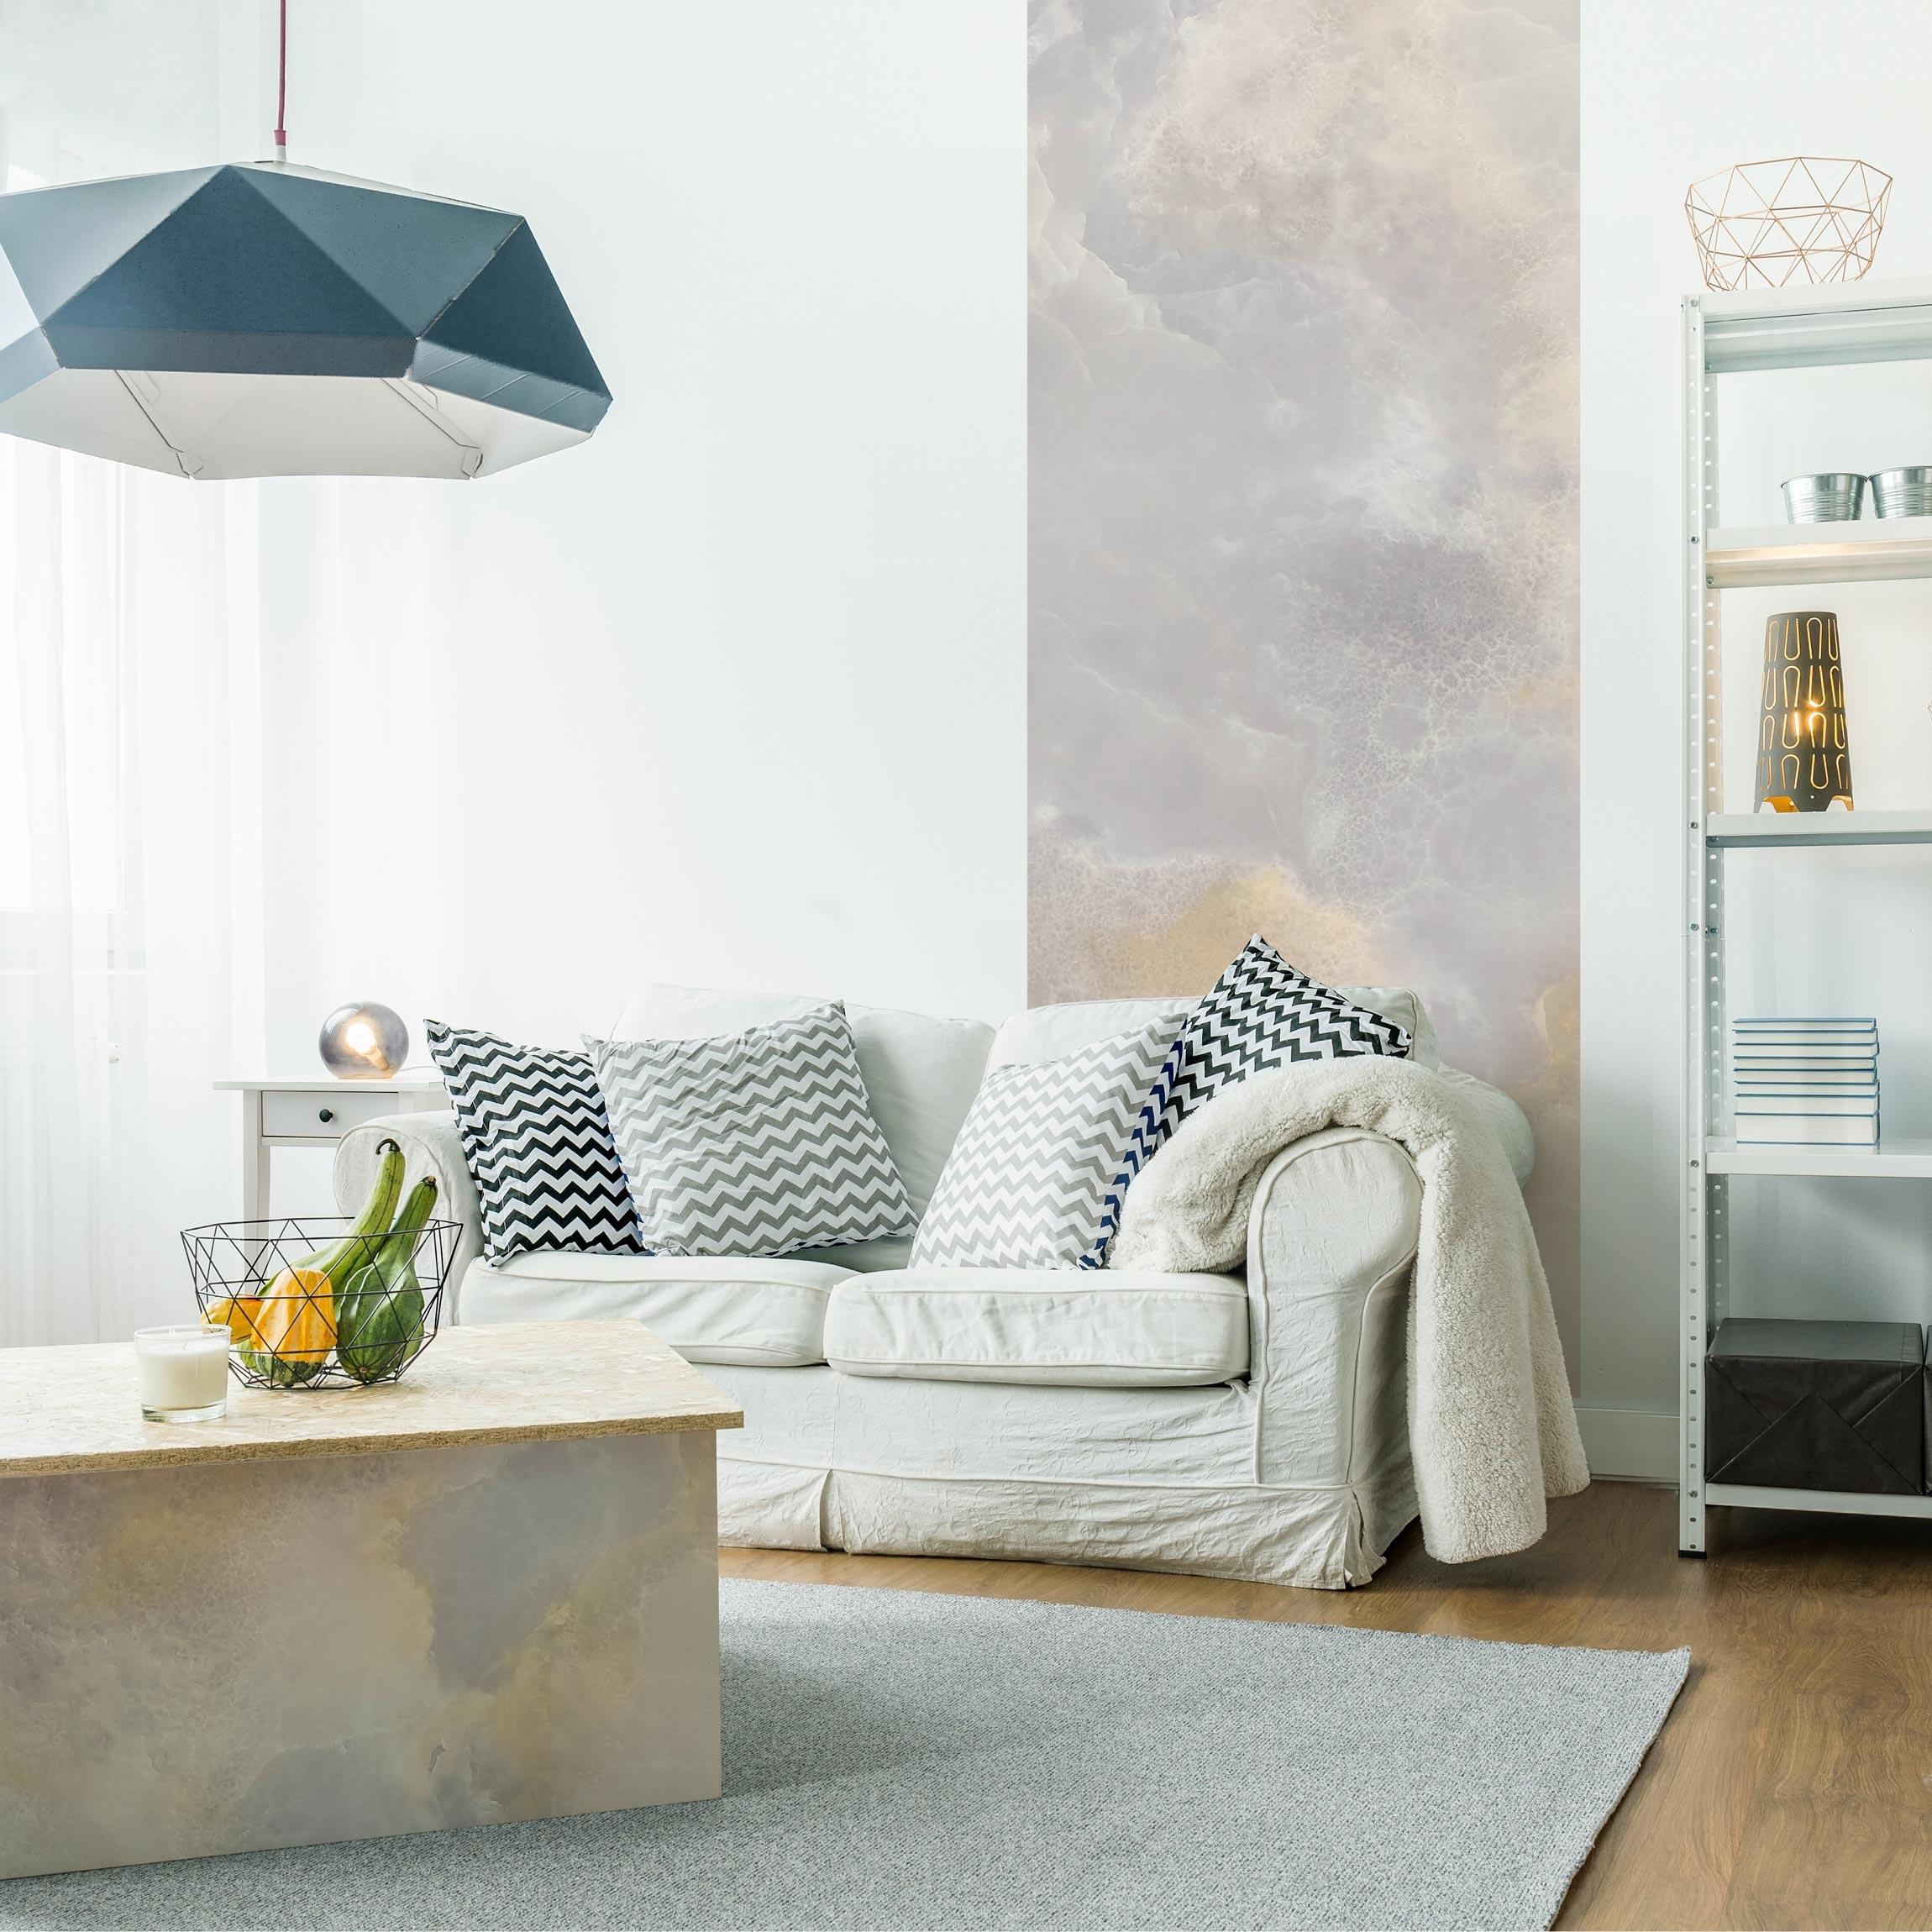 Klebefolie marmoroptik onyx marmor grau marmorfolie - Klebefolie betonoptik ...